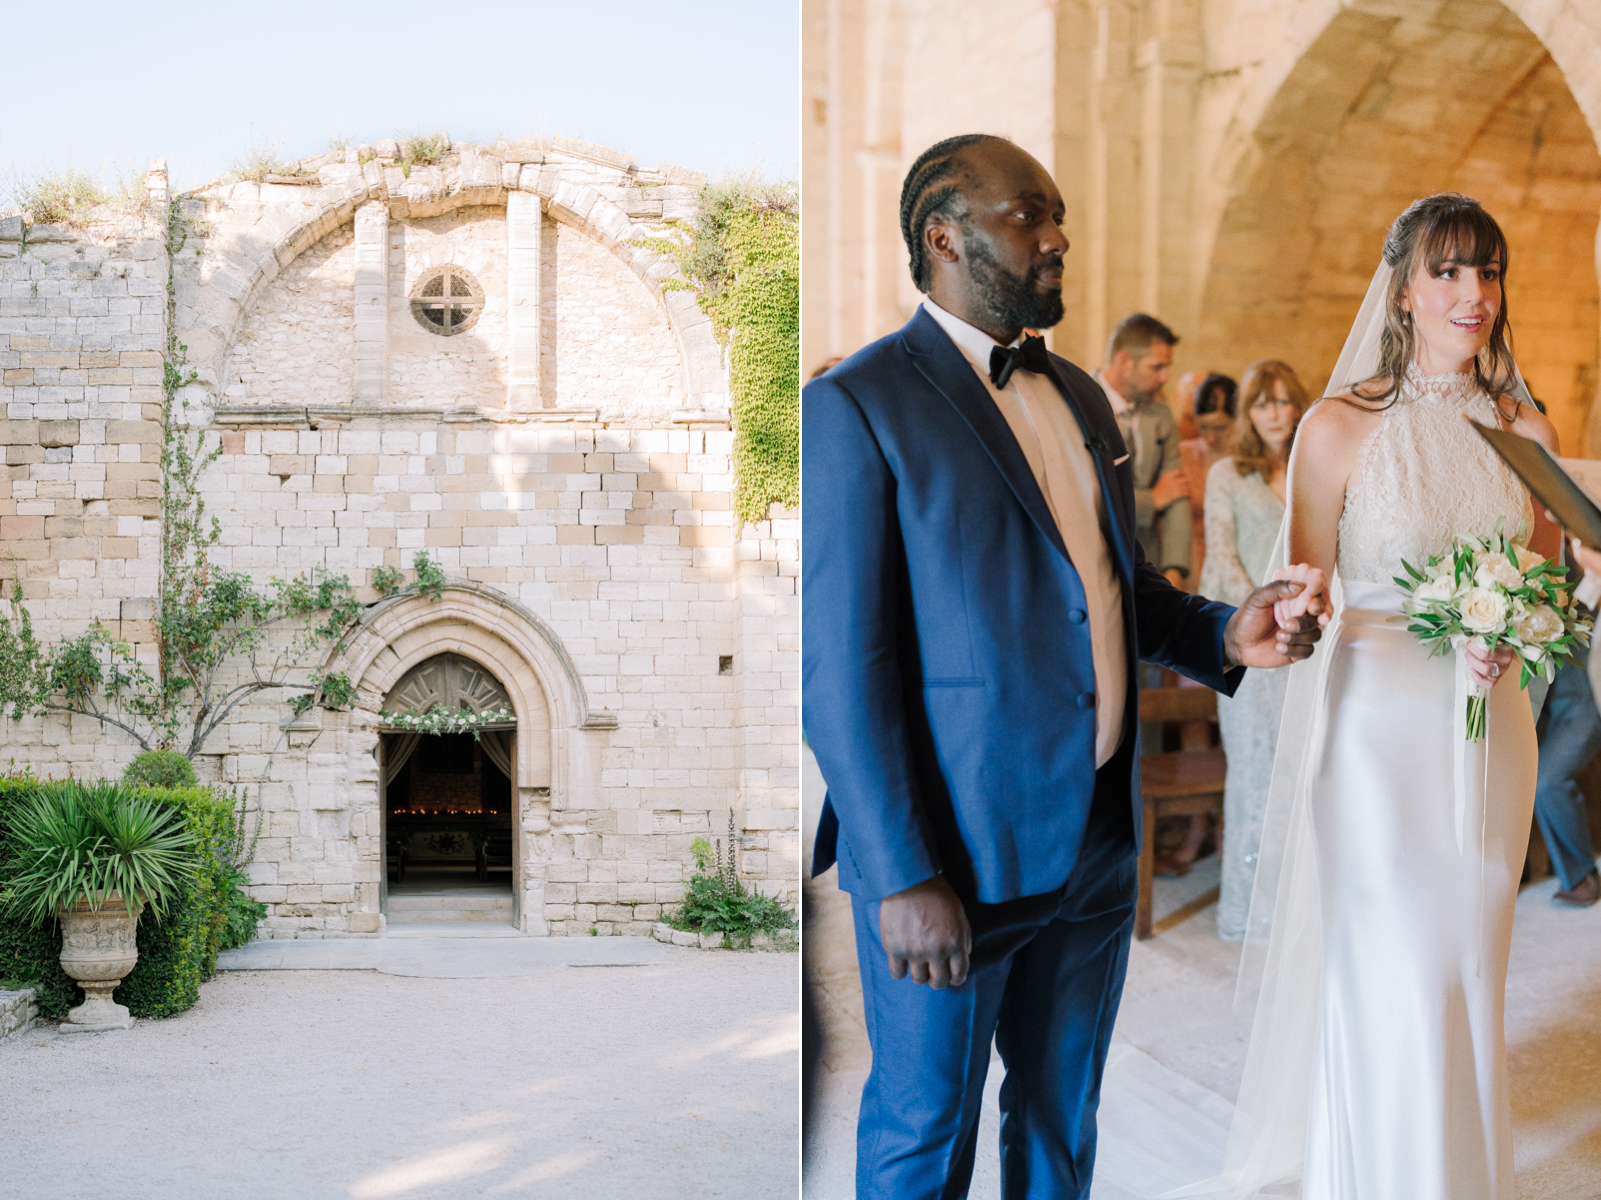 Boheme-Moon-Photography-Wedding-in-Provence-France_015.jpg